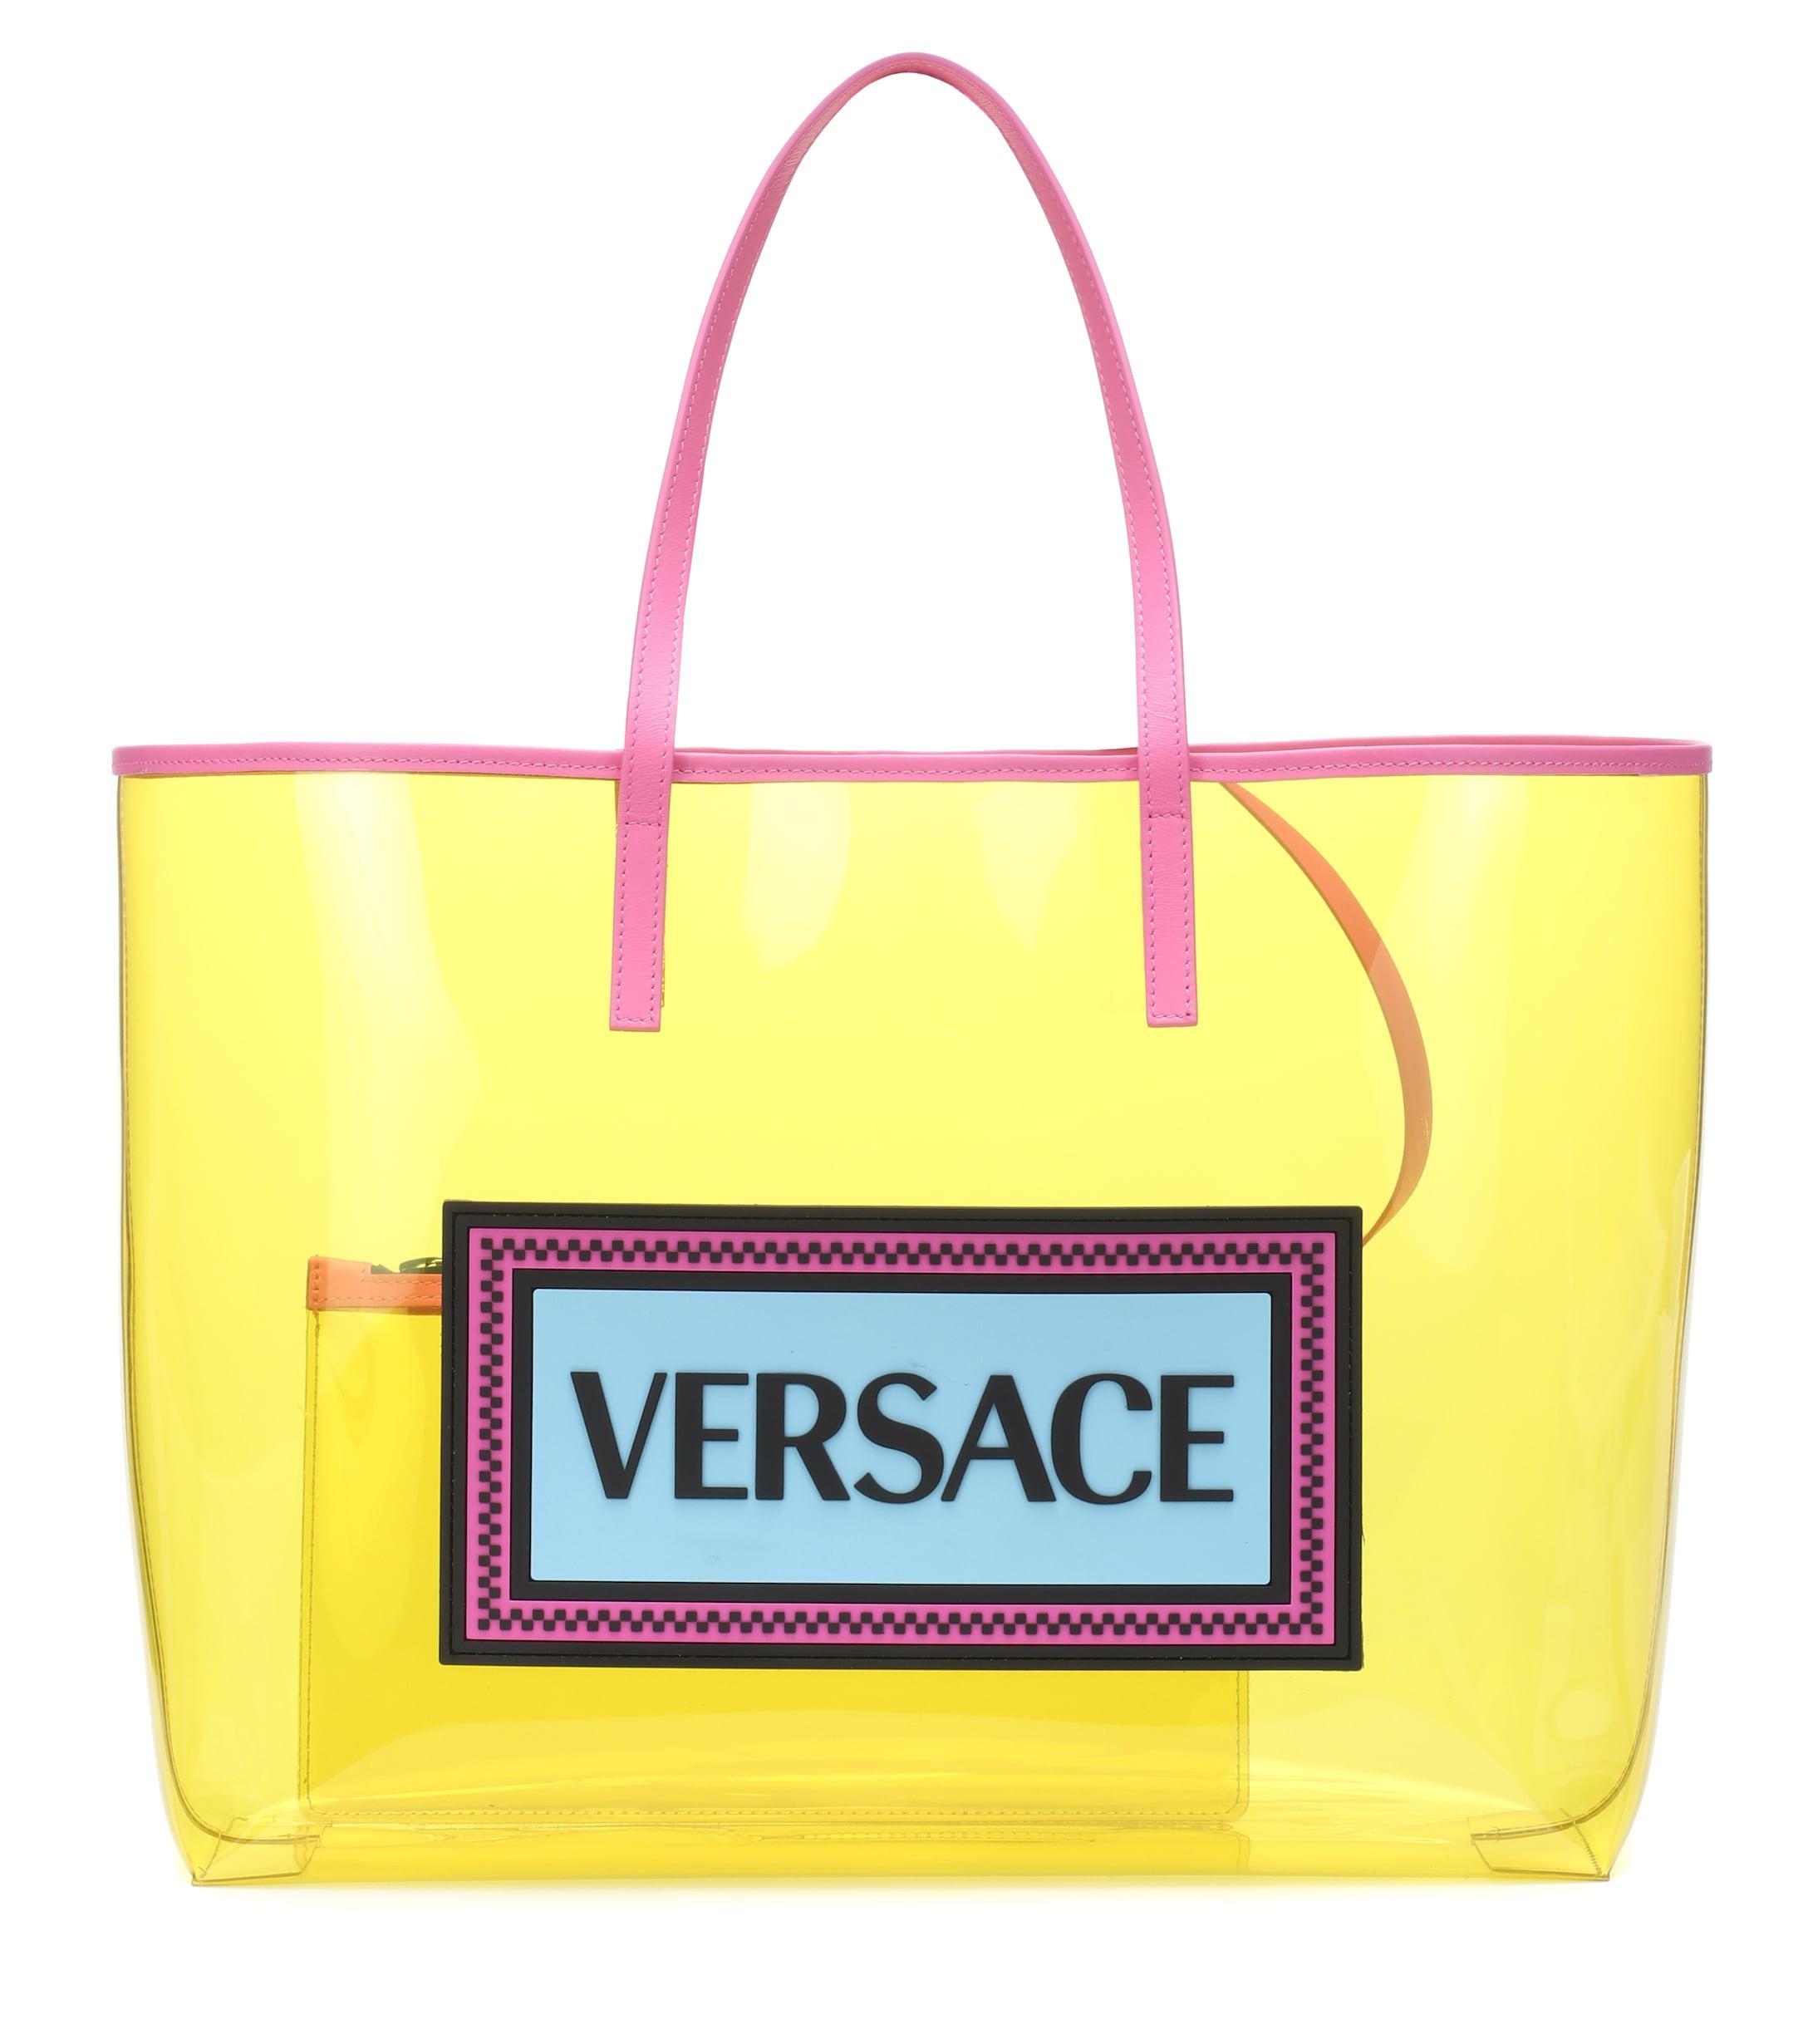 4748b0bda7 Versace - Yellow Pvc Tote - Lyst. View fullscreen